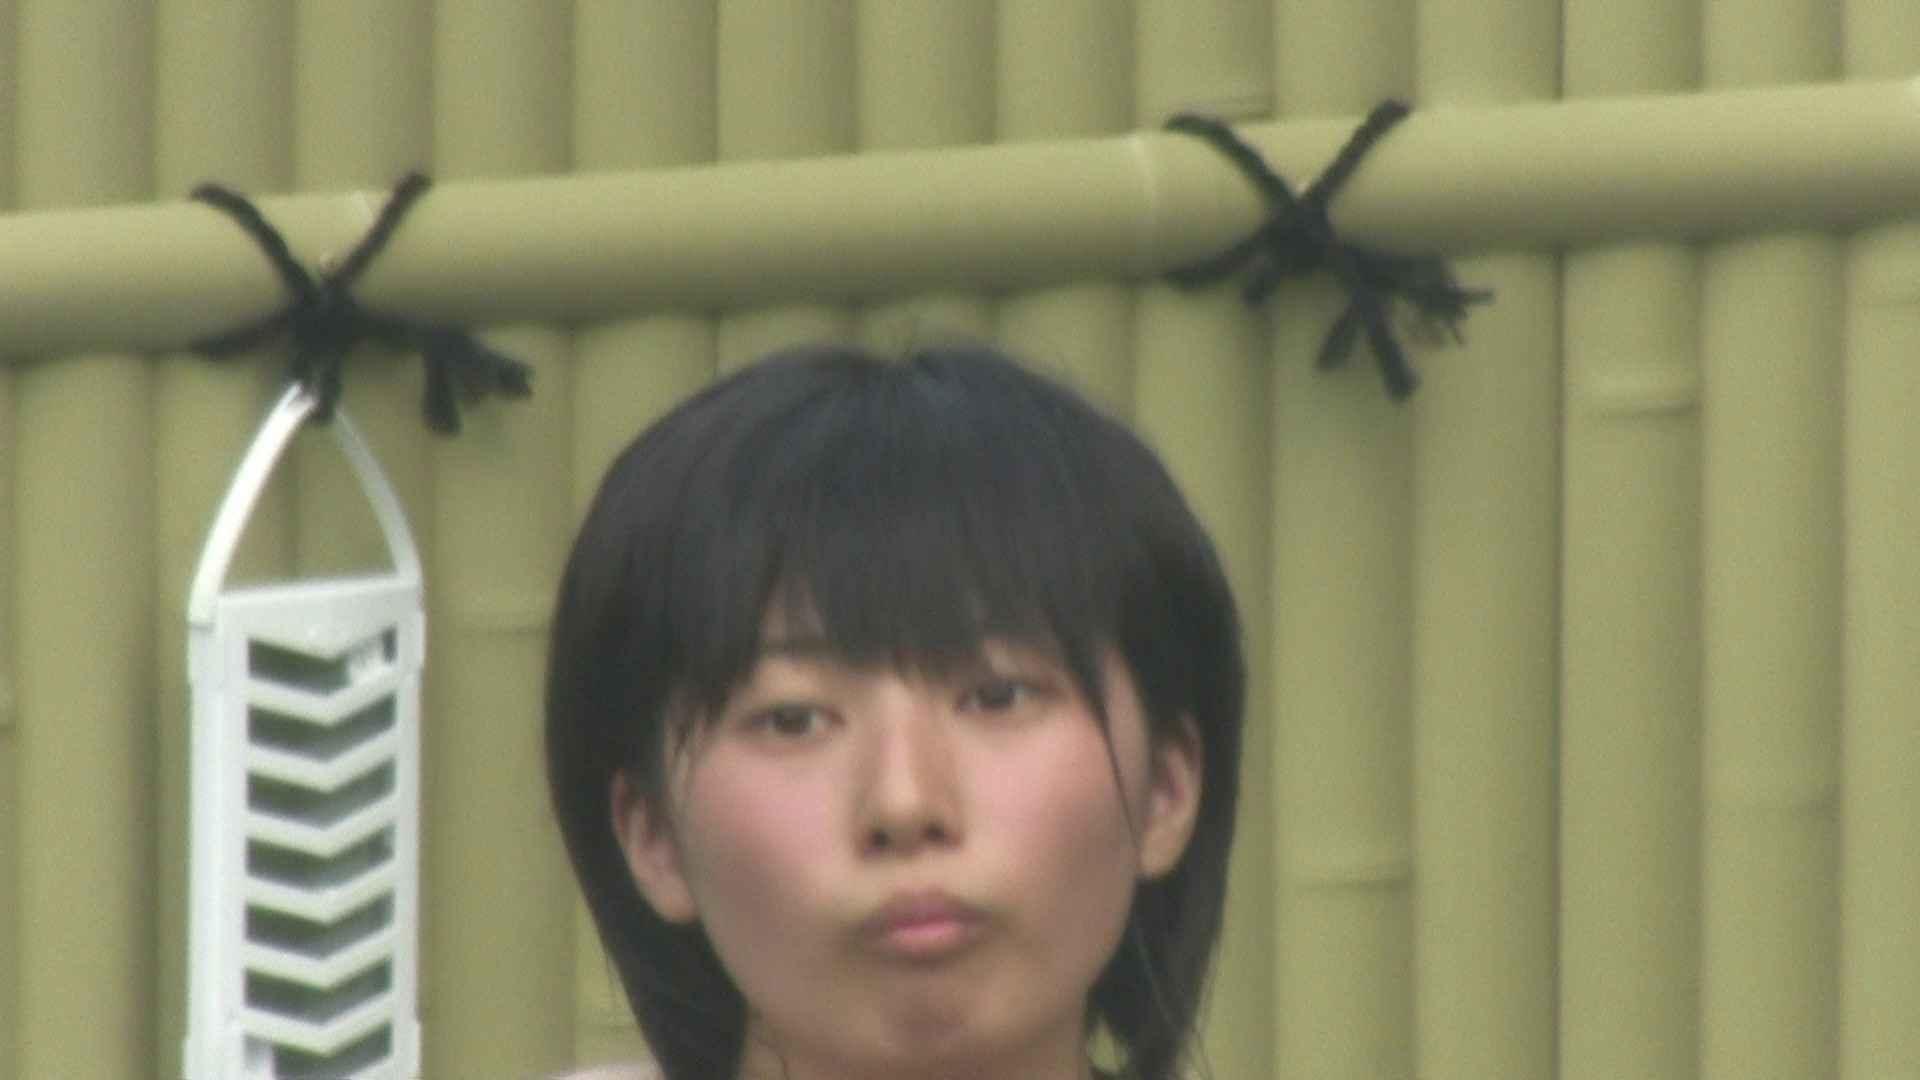 Aquaな露天風呂Vol.197 0  33連発 25